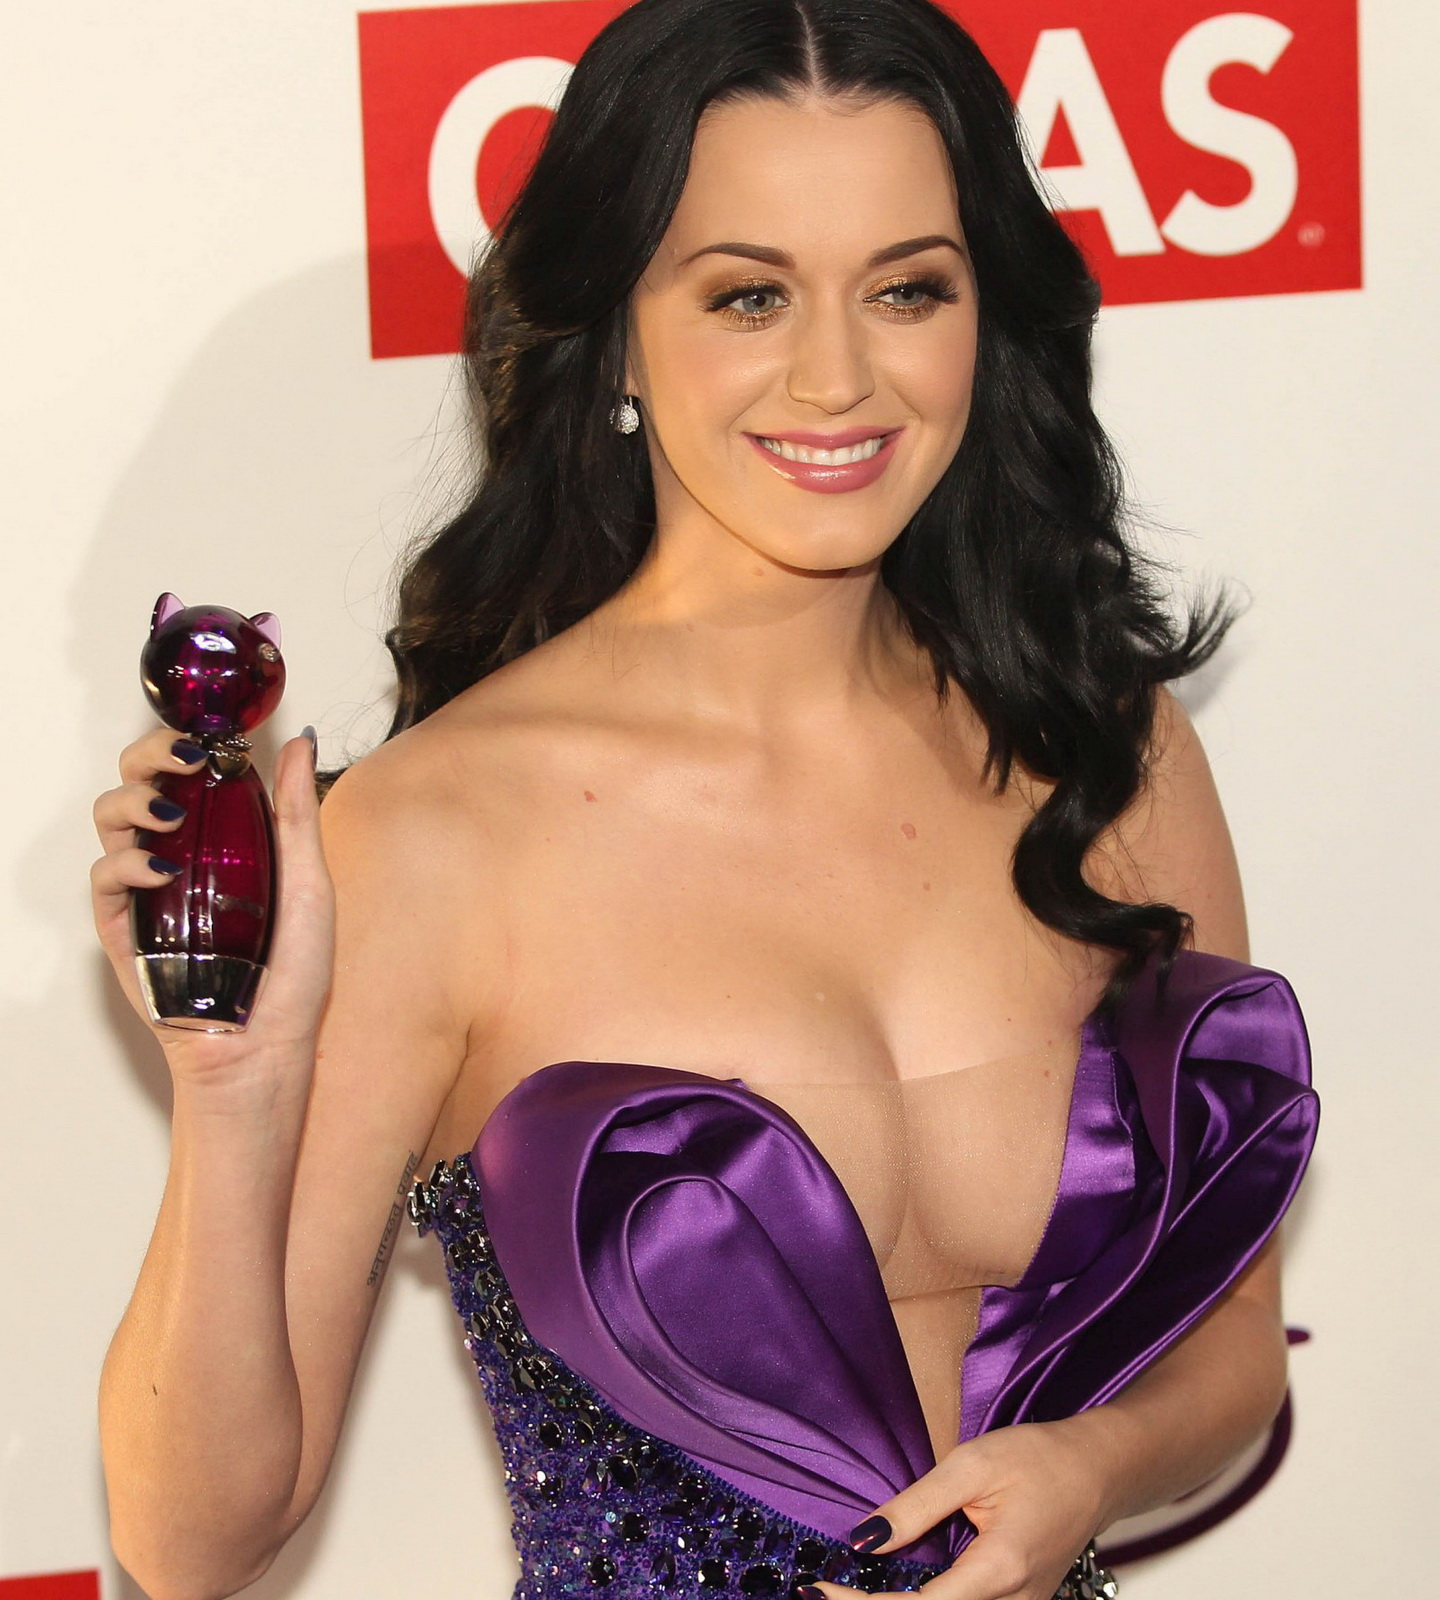 http://3.bp.blogspot.com/-GmFp8hJ_Pw8/TqF5d0sjD8I/AAAAAAAAAhs/QROSSZyr118/s1600/katy+peryy+hairstyles-hairstyles-junninho.blogspot.com-Katy-Perry-cleavage.jpg